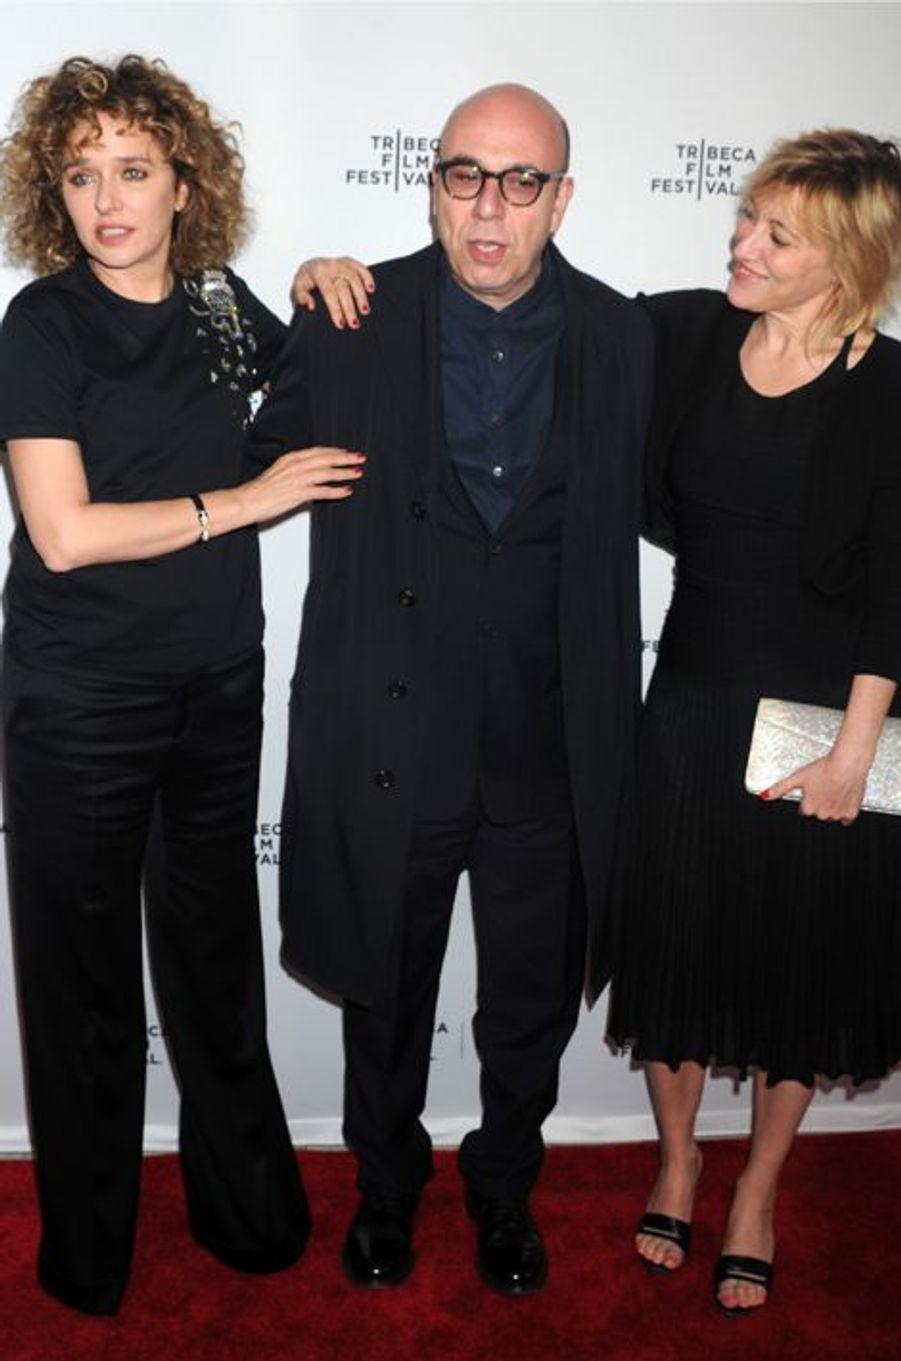 Les actrices avec Paolo Virzi